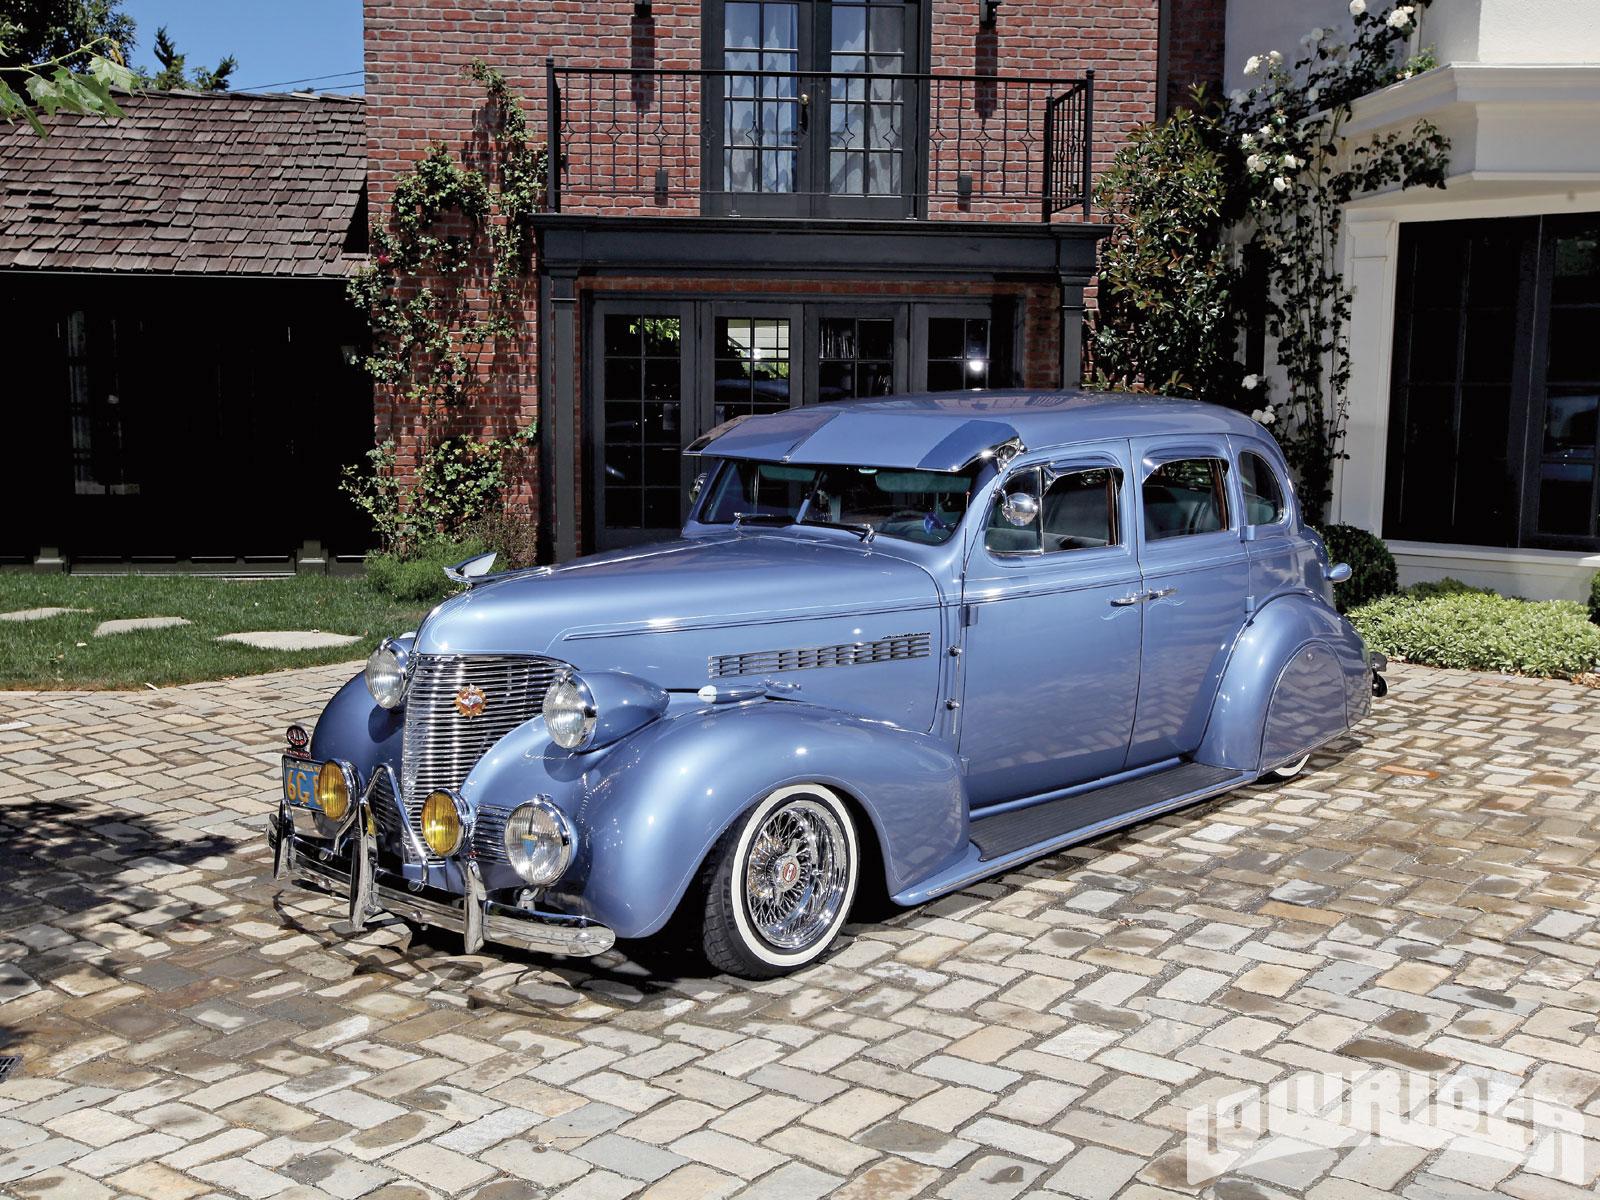 1939 Chevrolet Master Deluxe - Lowrider Magazine